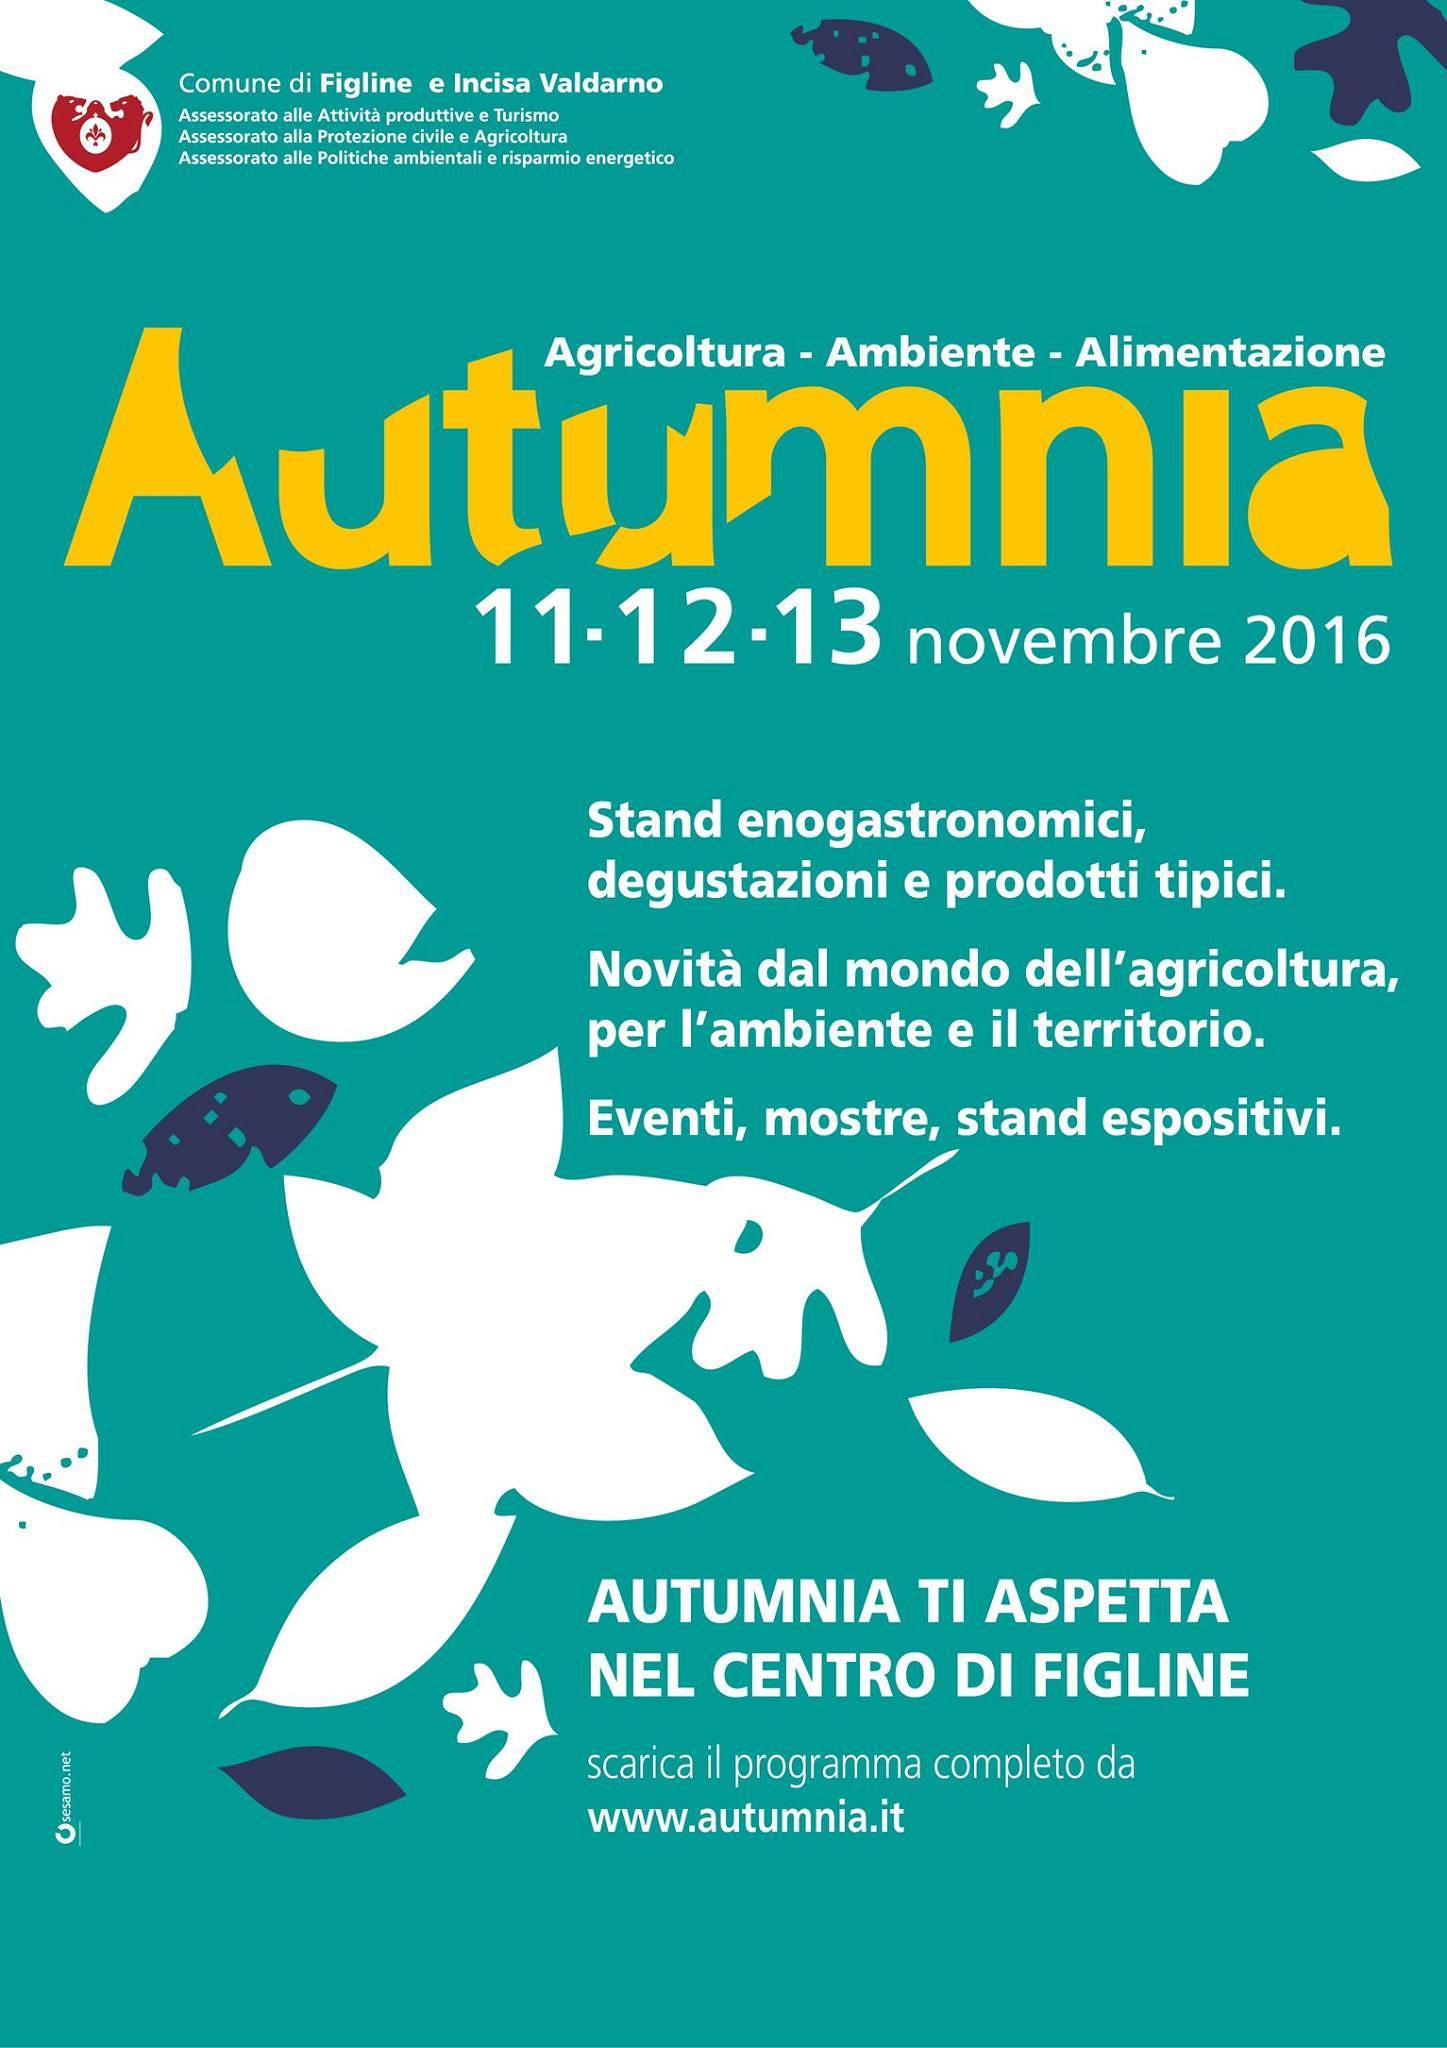 La civilta' contadina ad Autumnia 2016